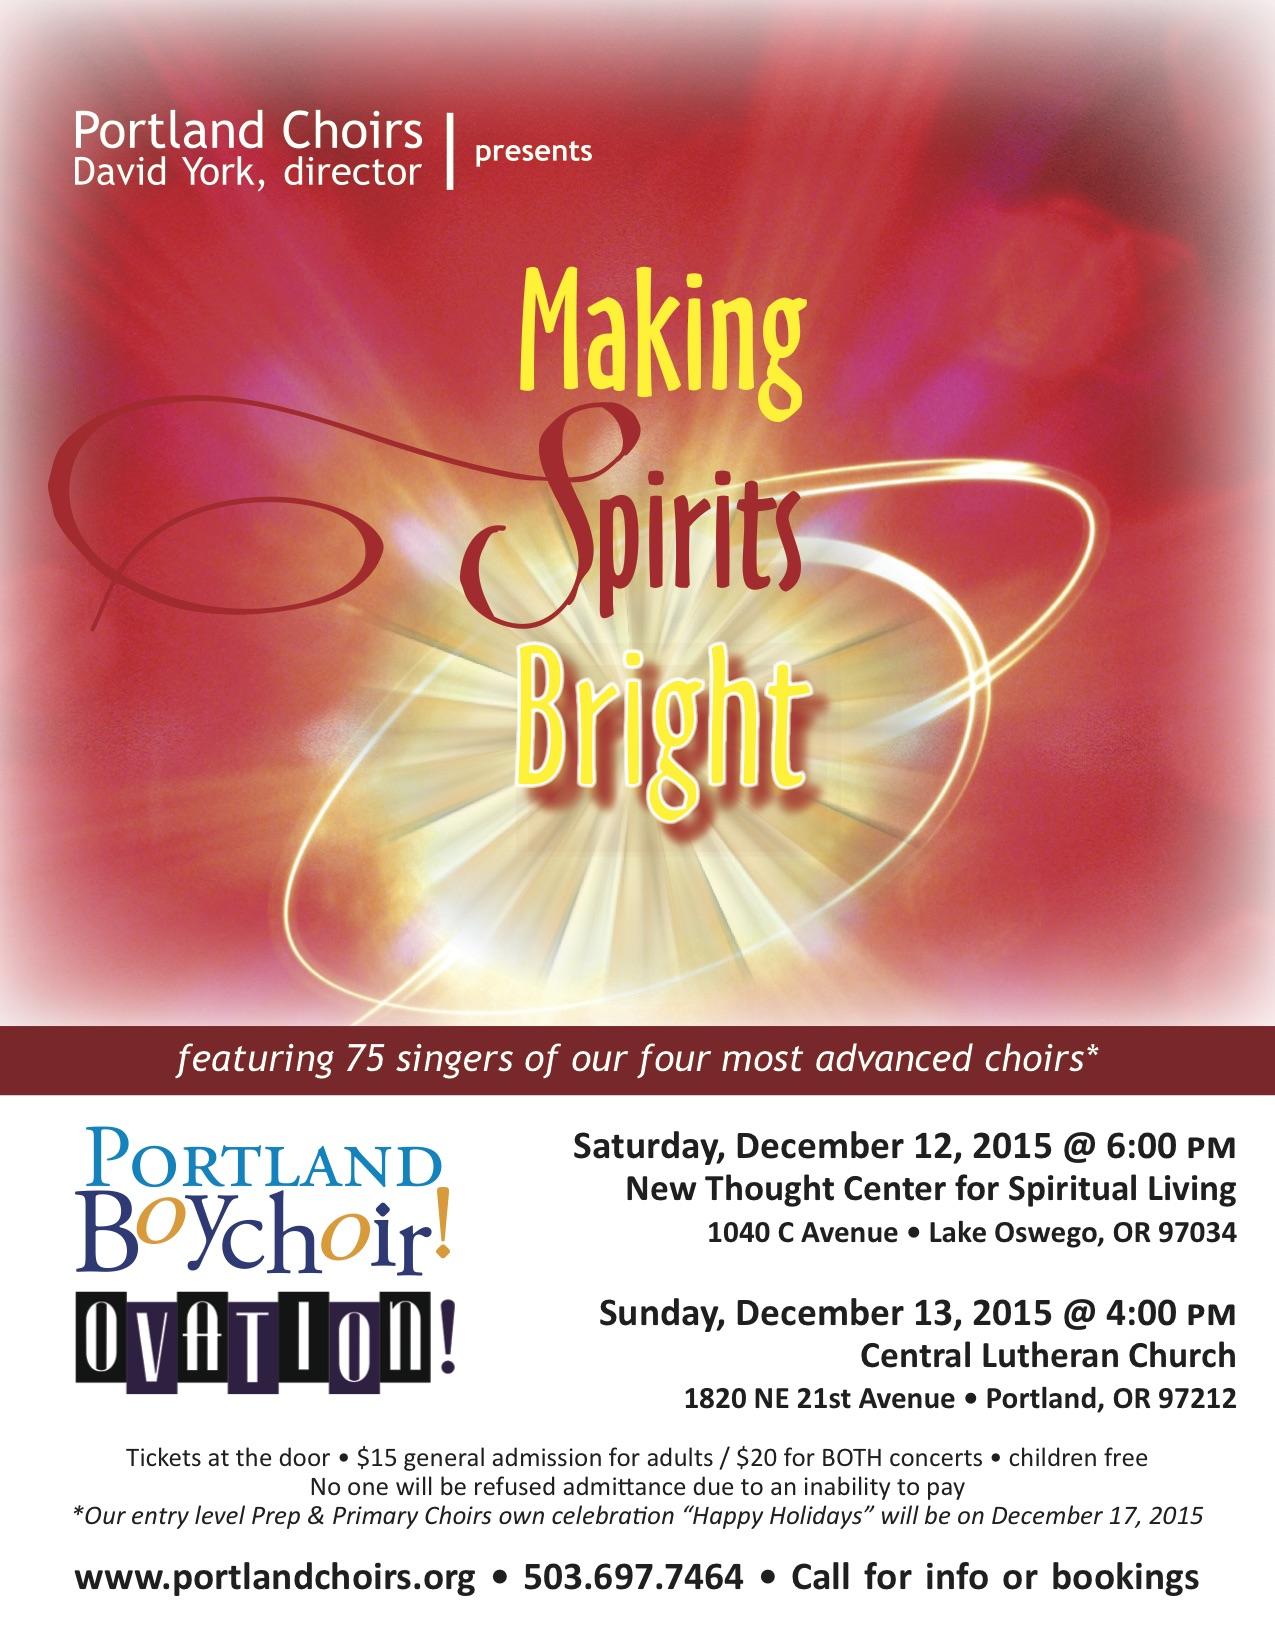 Making Spirits Bright 121215 & 121315 Final